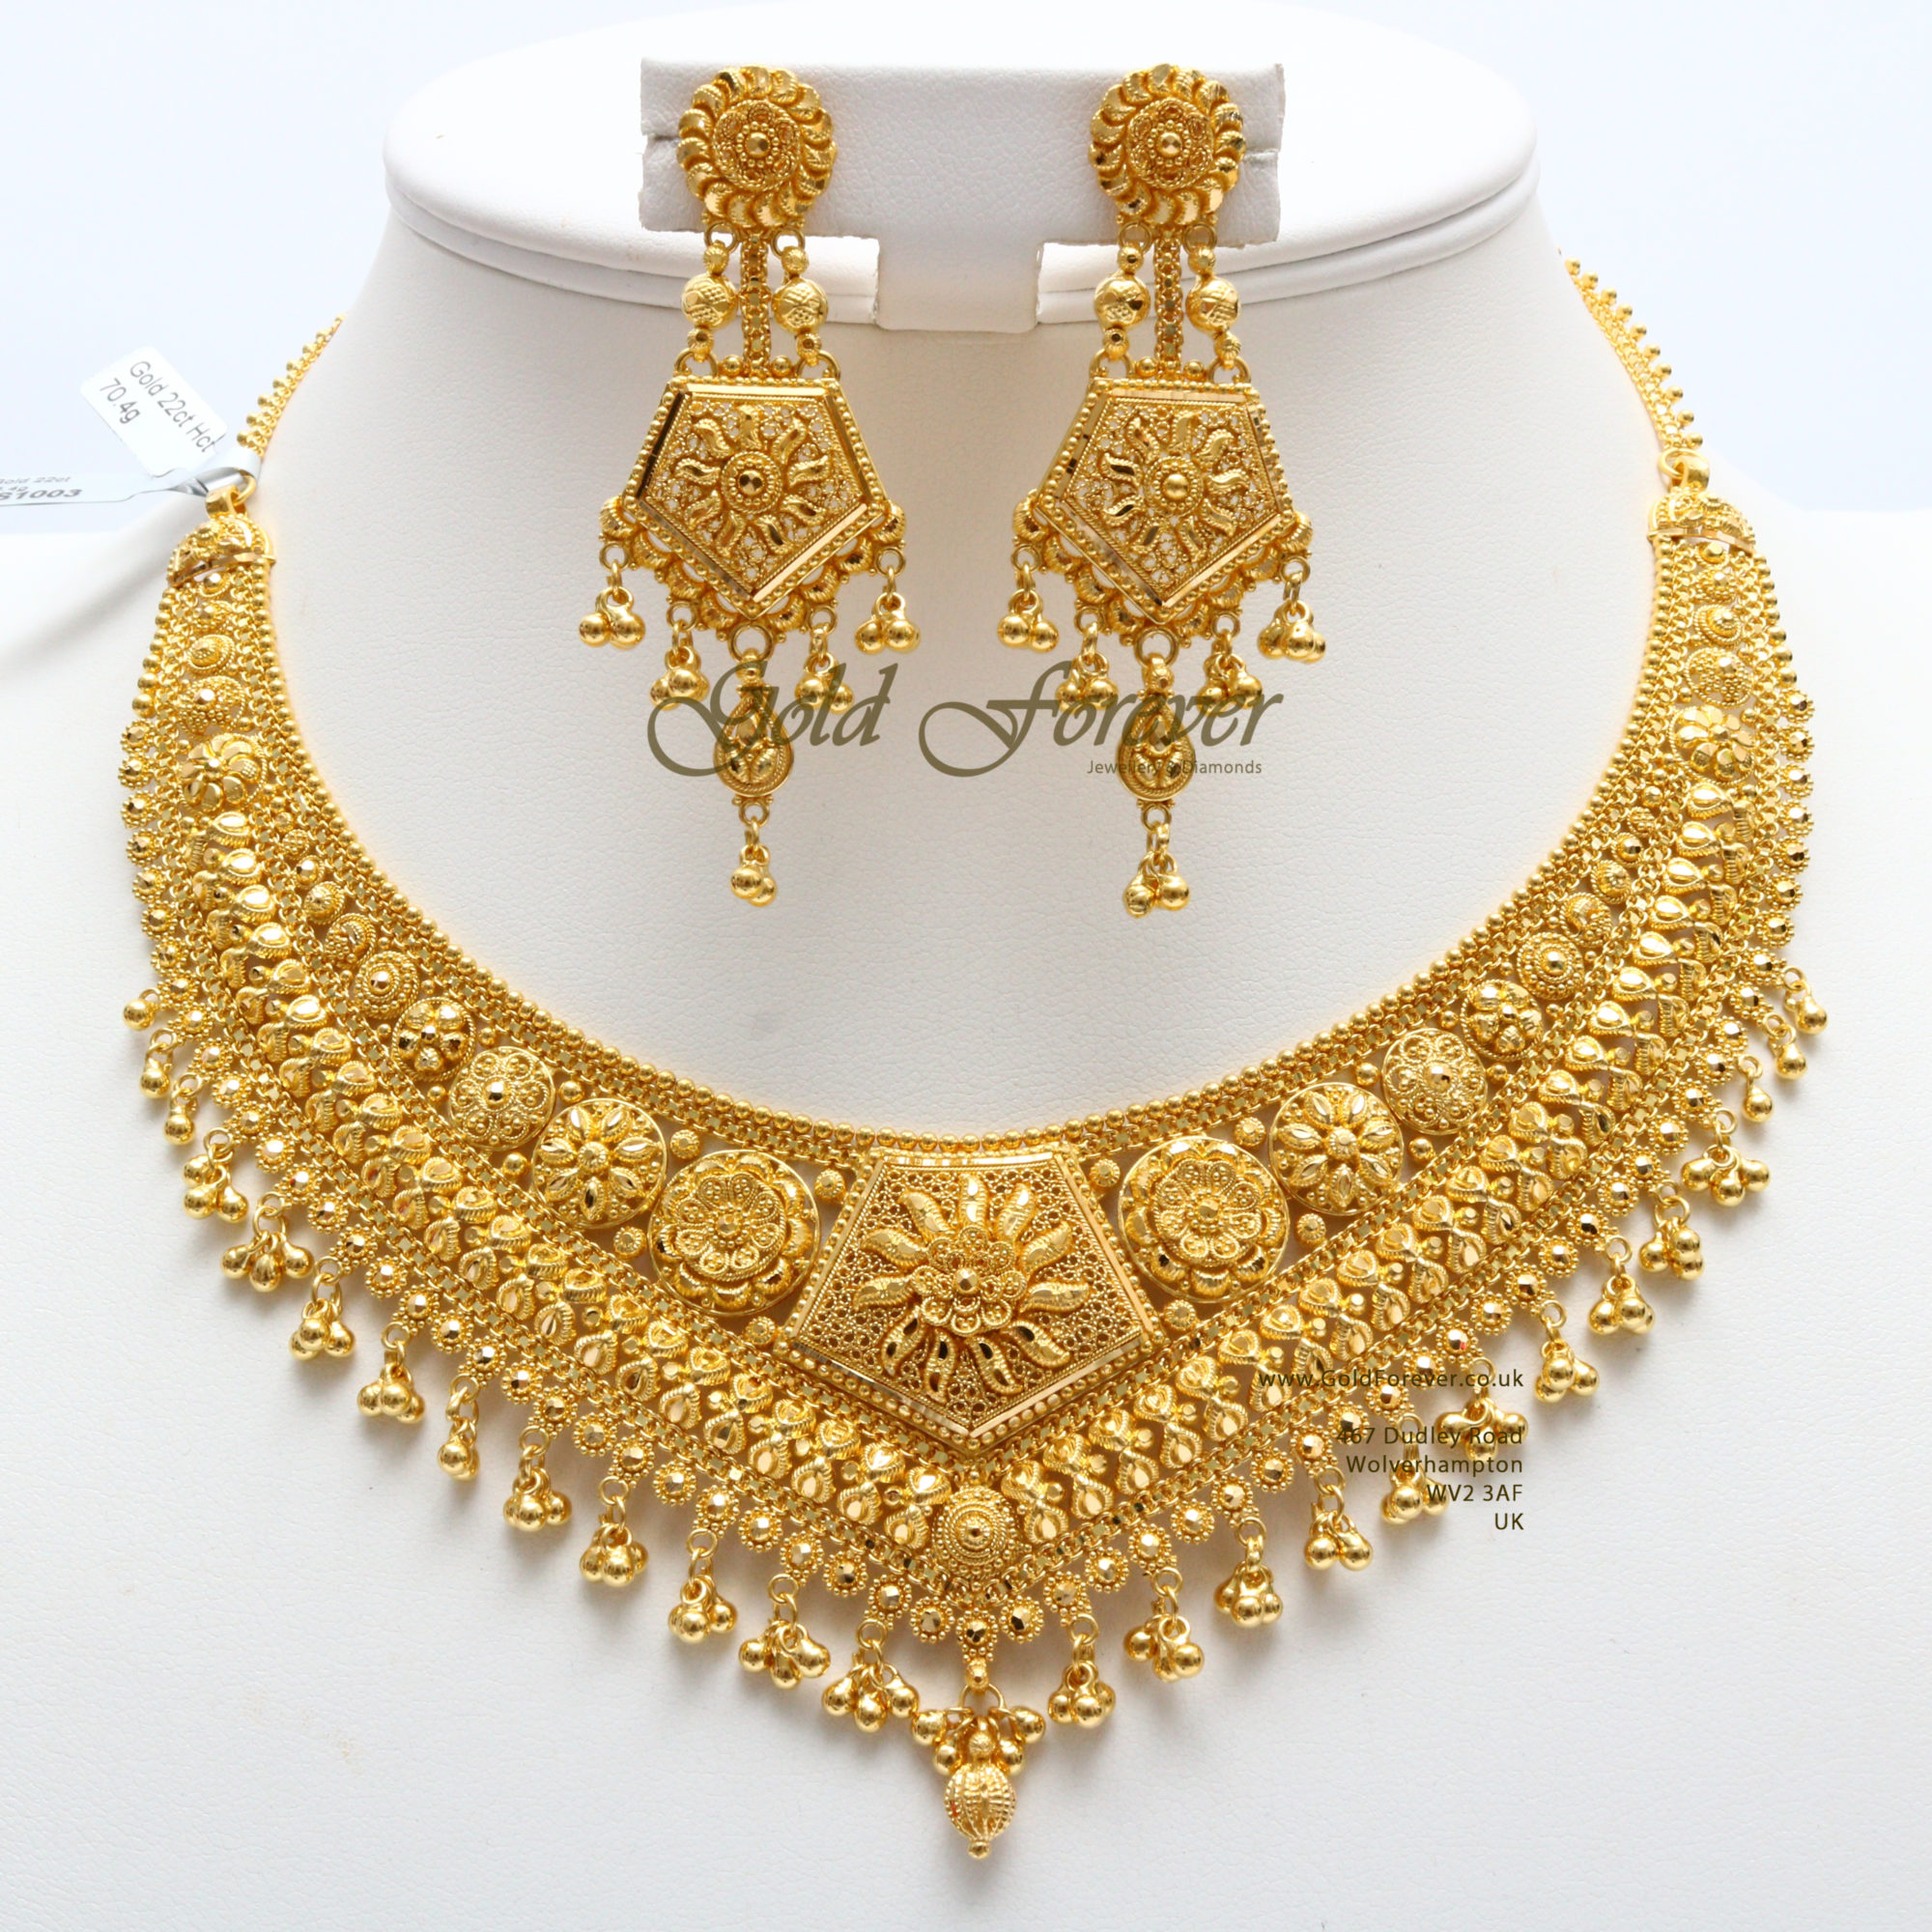 22 Carat Indian Gold Necklace Set 70.4 Grams code:NS1003 ...  |Indian Gold Pendants